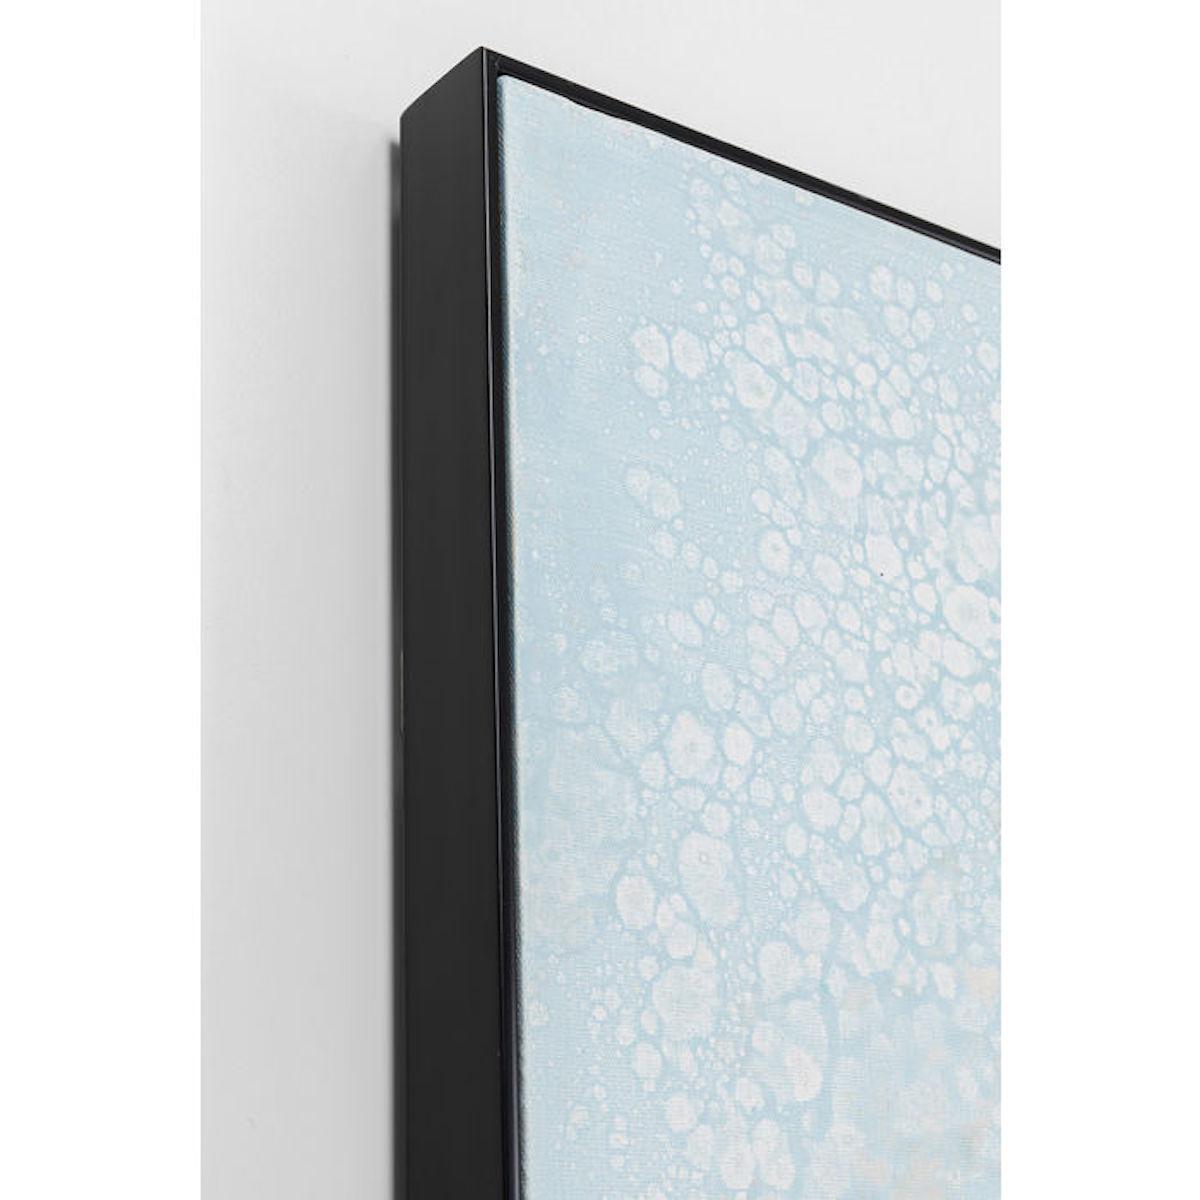 Tableau 180x180cm SWARM OF FLAMINGO Kare Design